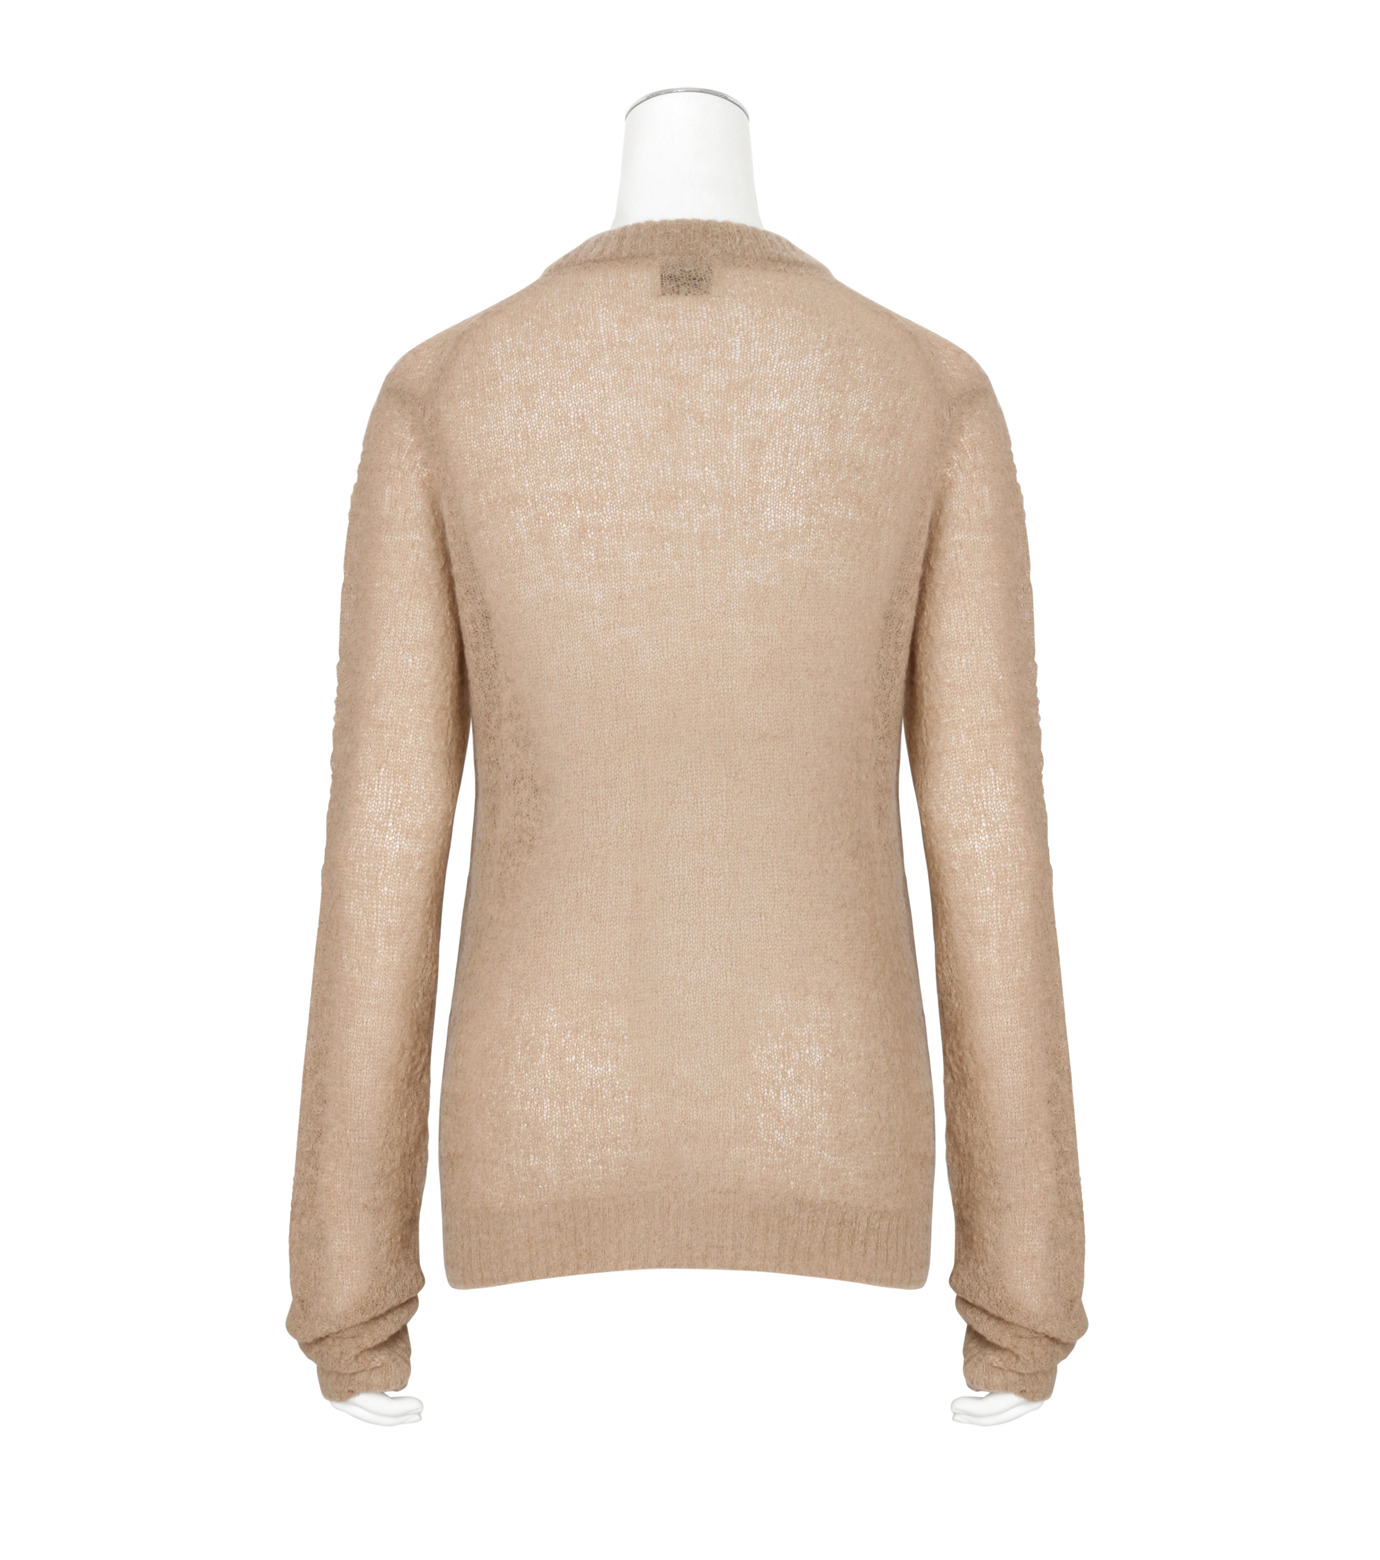 ACNE STUDIOS(アクネ ストゥディオズ)のAlpaca Extra LS Pullover-BEIGE(ニット/knit)-19F166-52 拡大詳細画像2